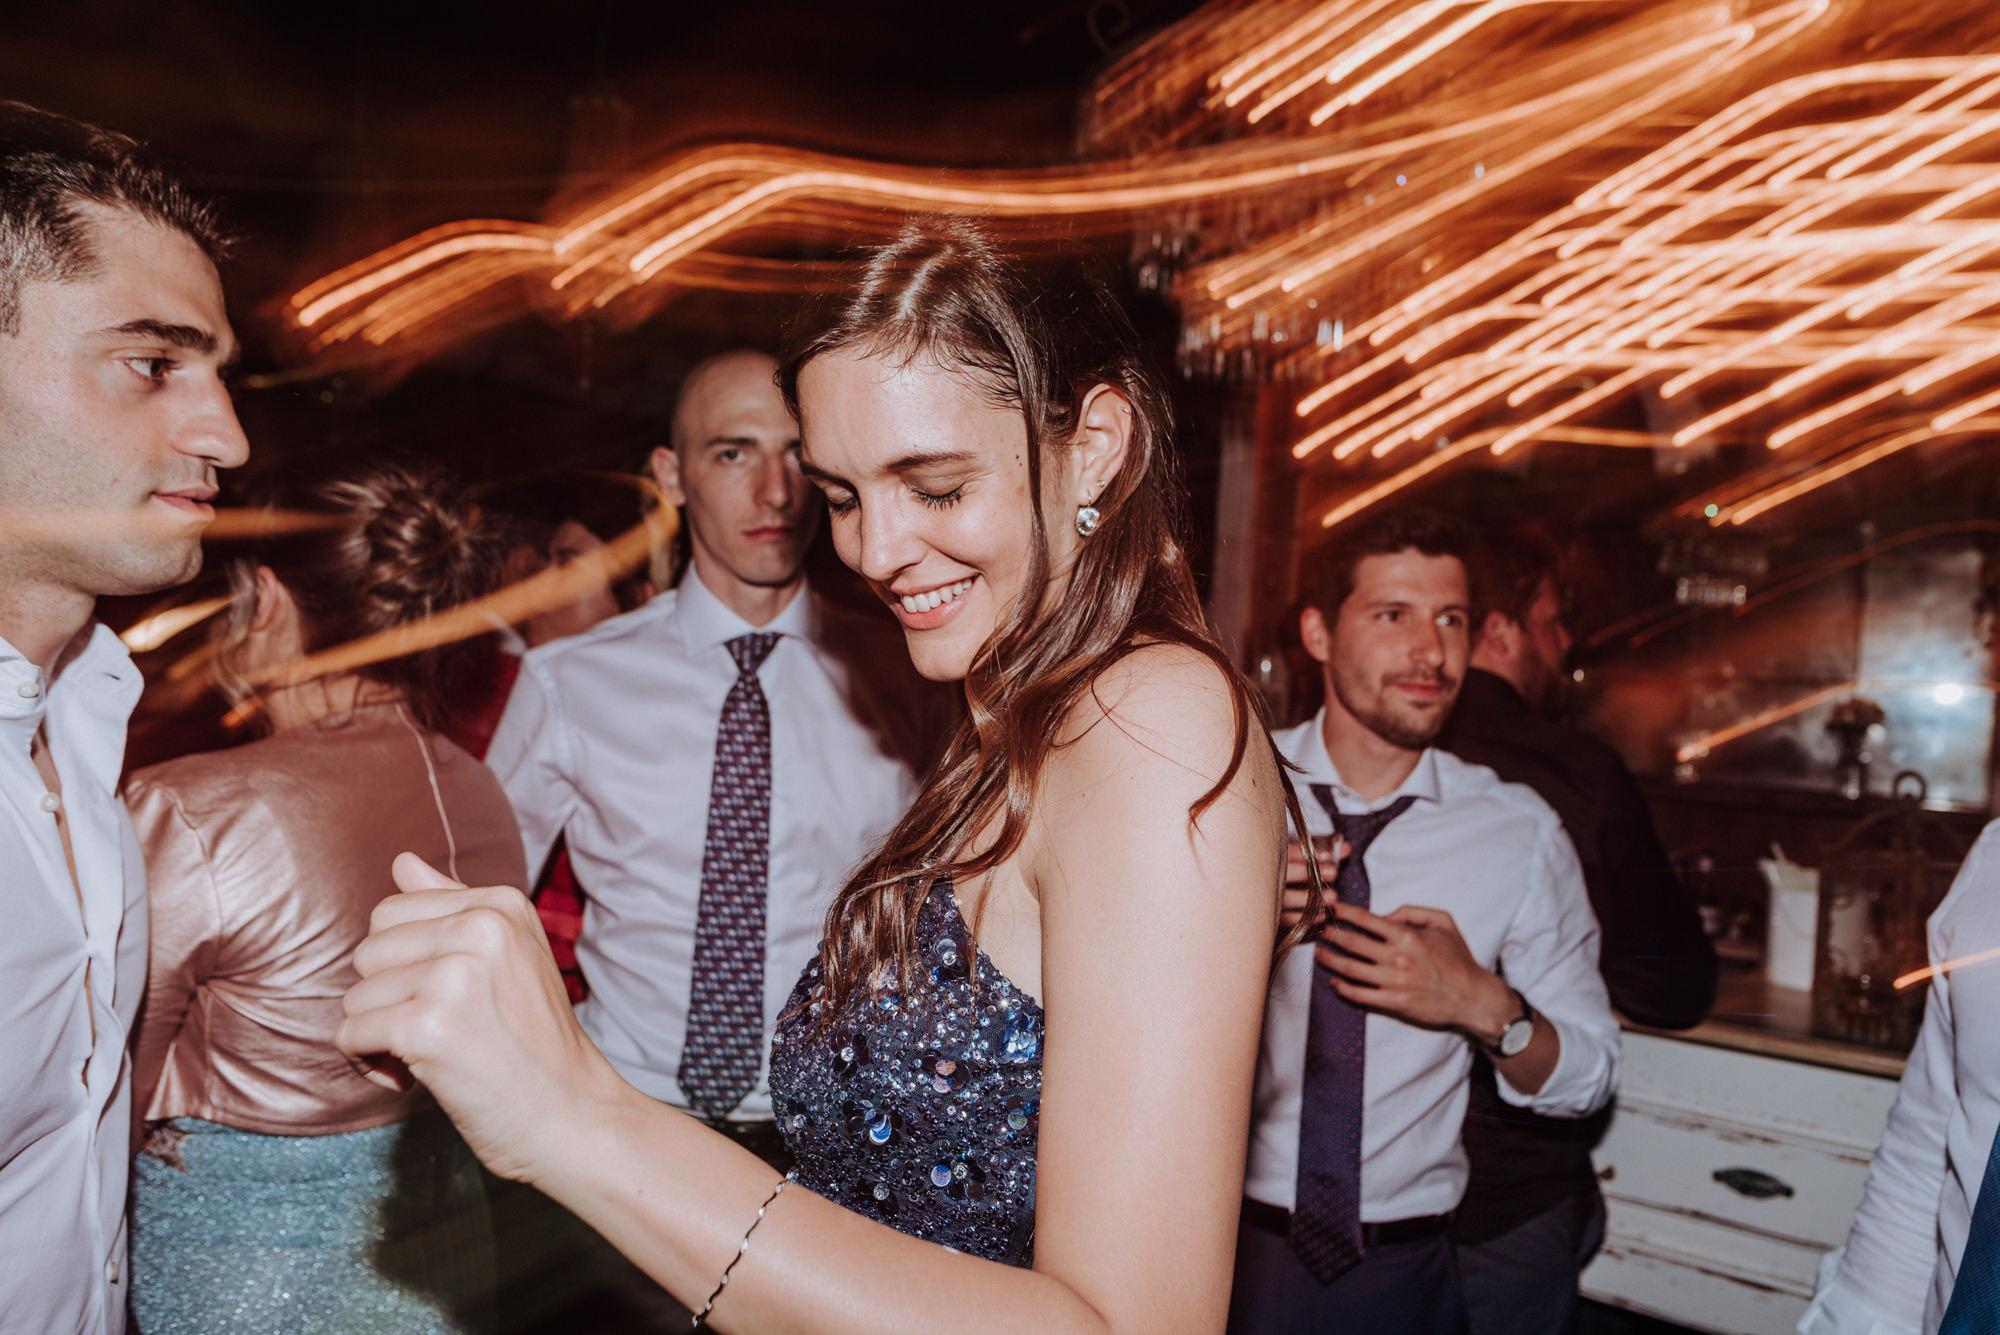 FOTO+PHOTO+BODA+WEDDING+ITALIA+ITALY+MAURICIO+GARAY+MAURICIOGARAY+WEDDINPHOTOGRAPHER+FOTOGRAFODEBODA-2198.jpg